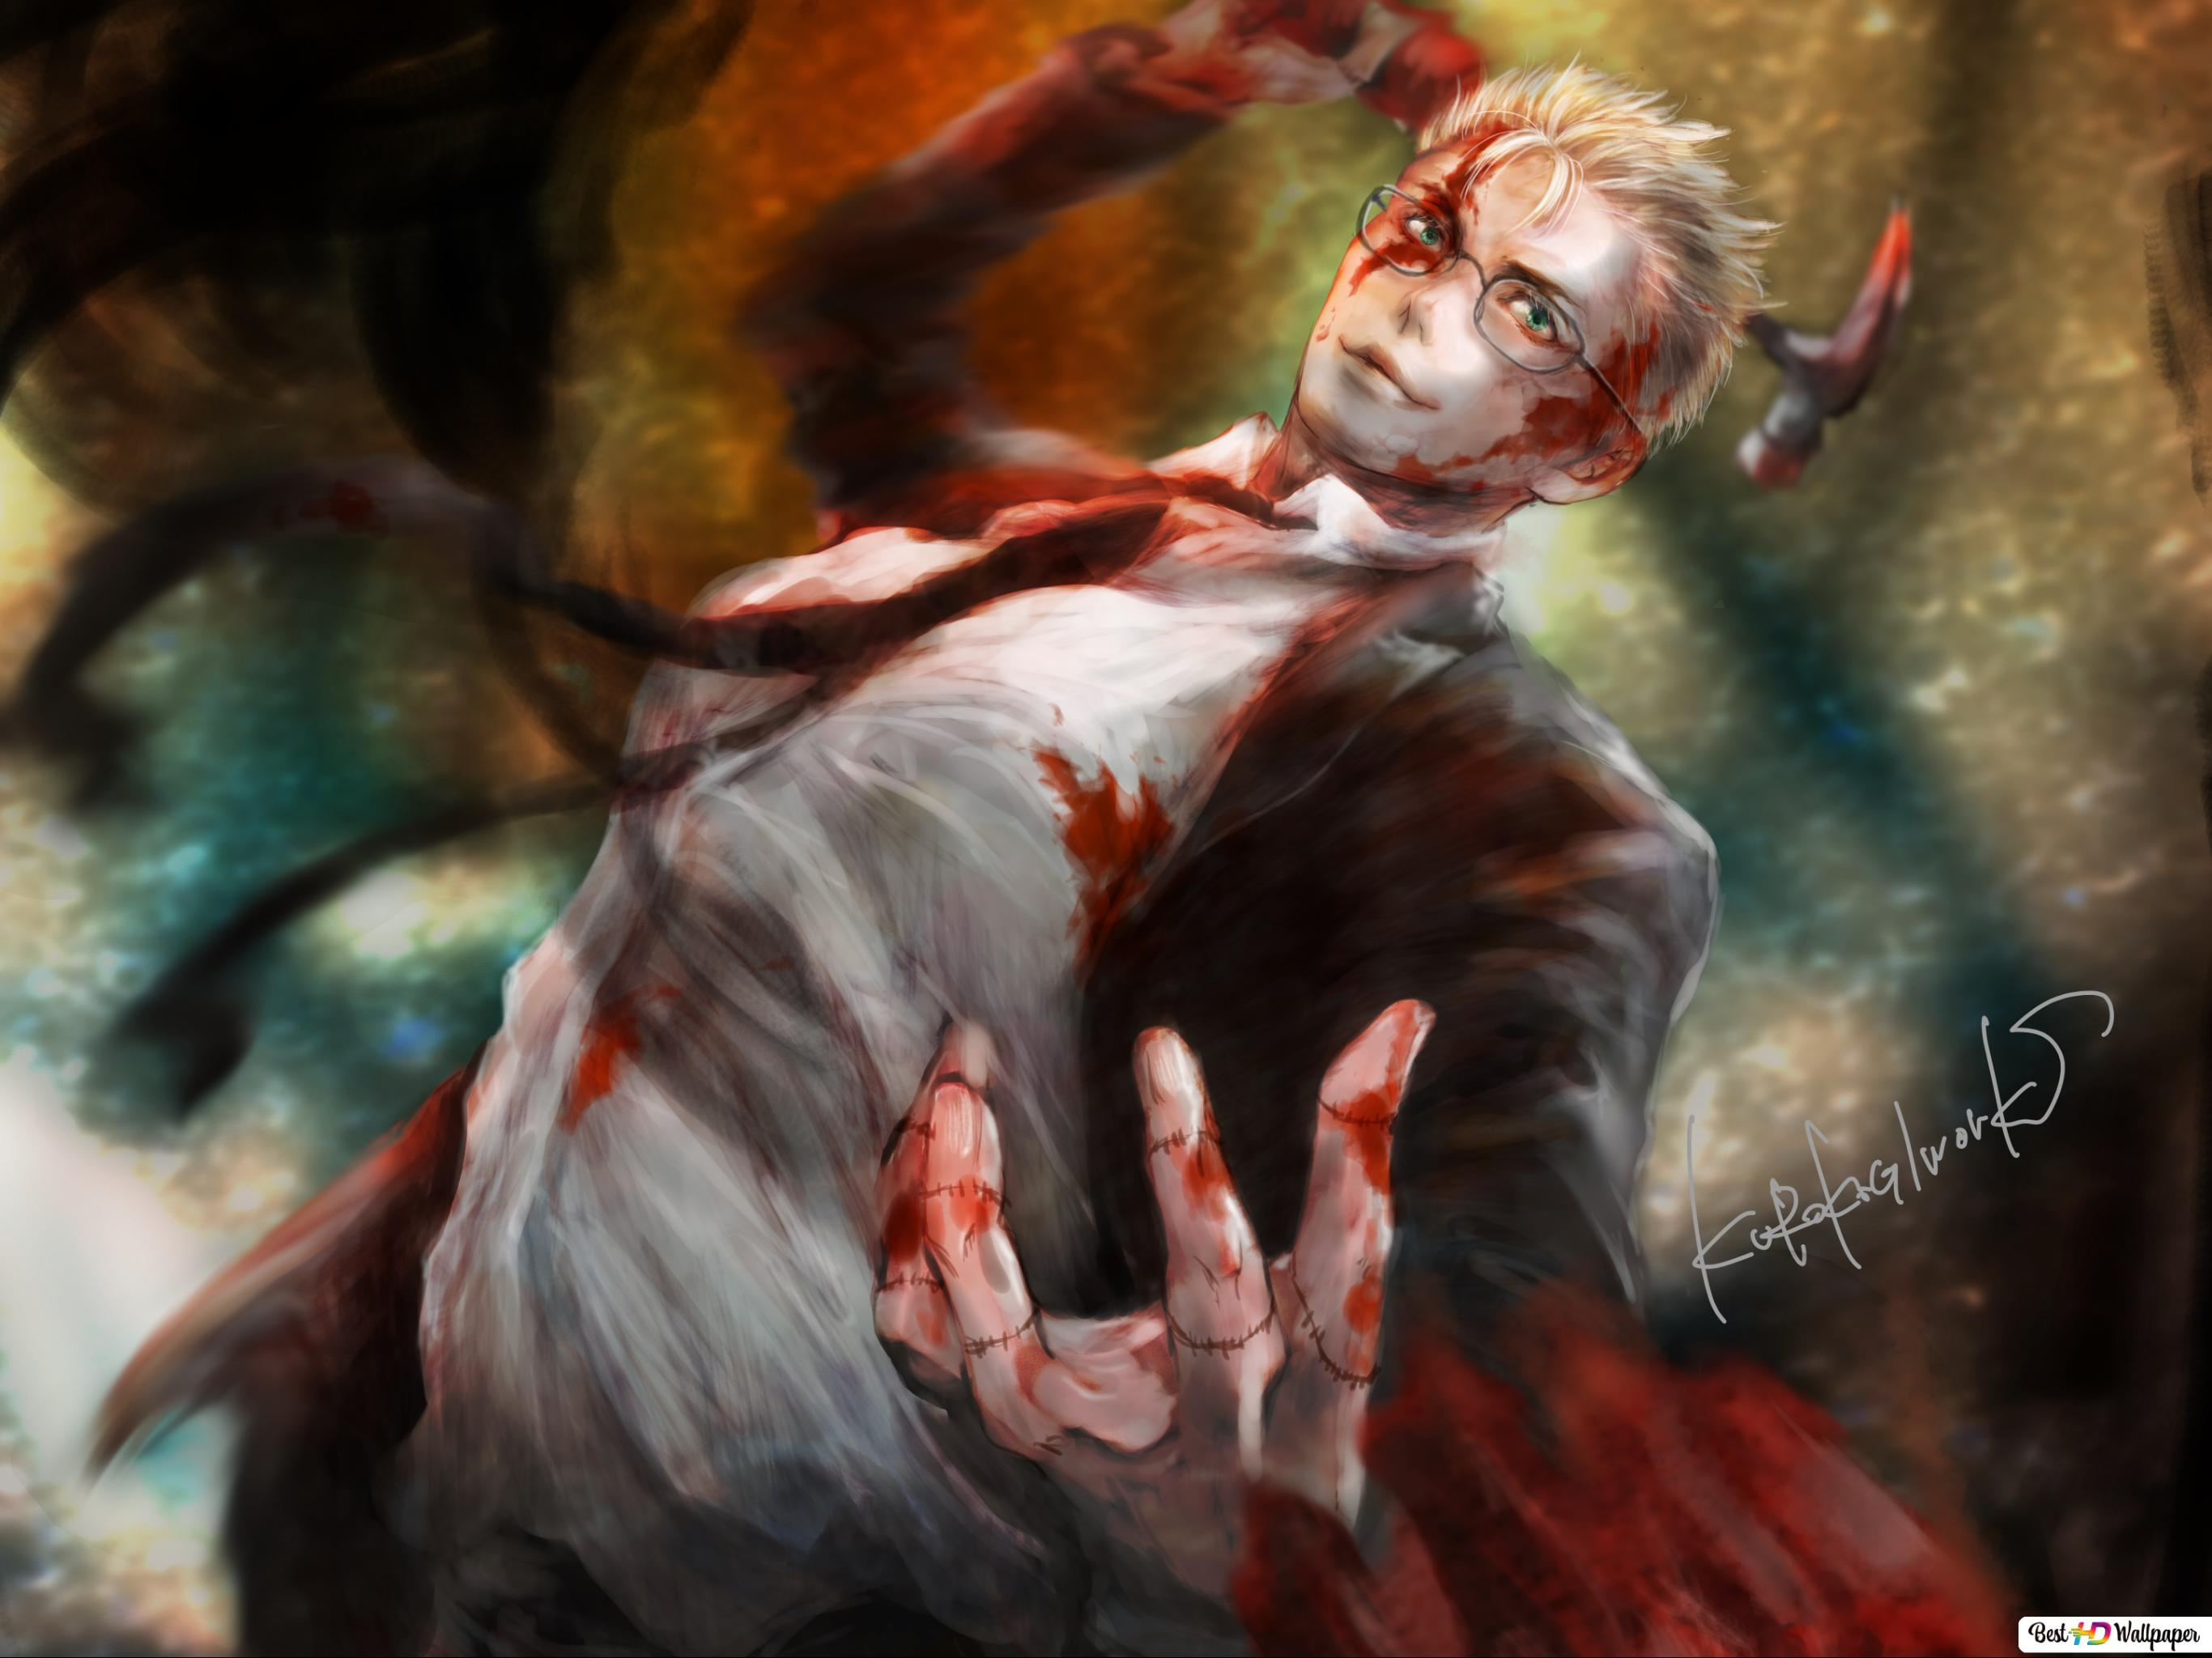 Dorohedoro Anime Wallpaper Hd Wallpaper Download